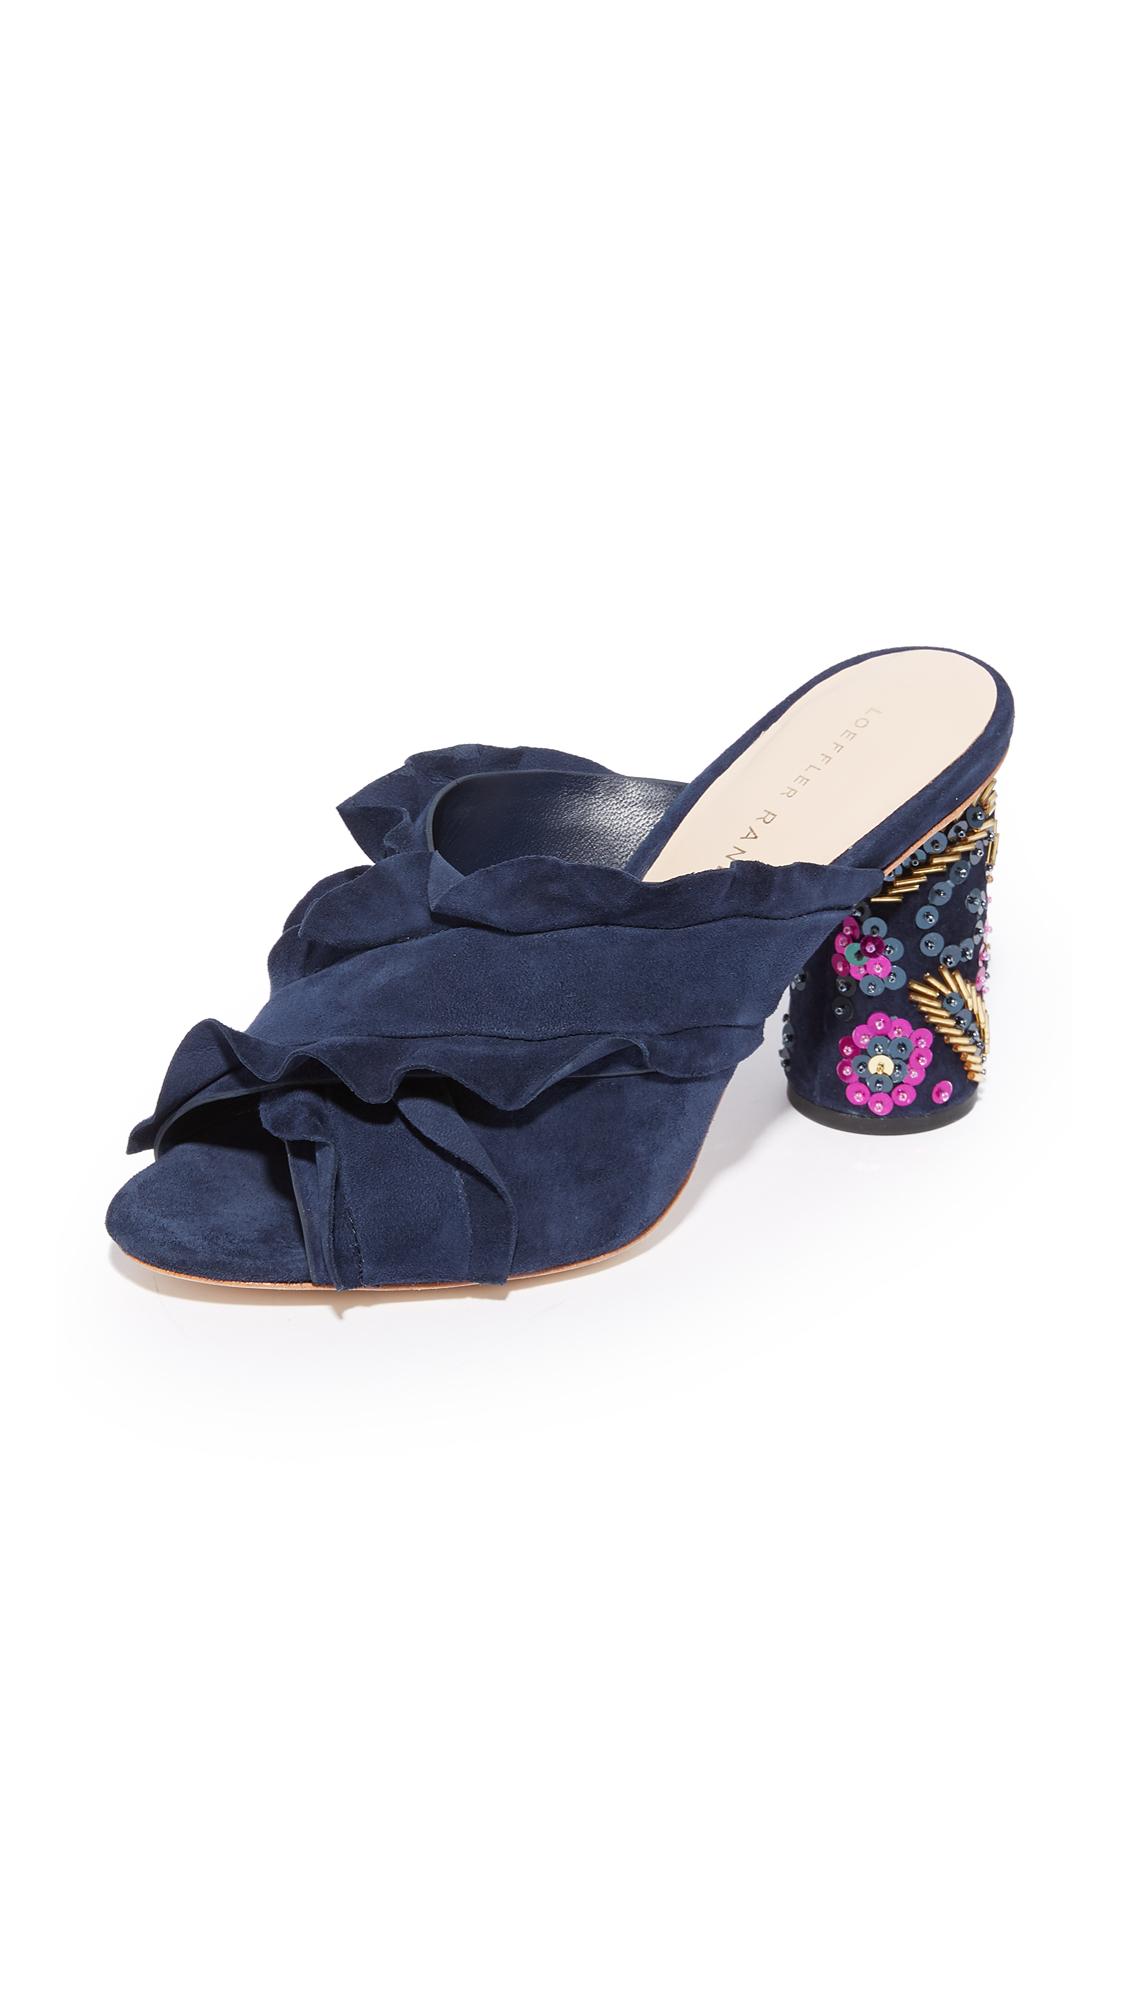 Loeffler Randall Kaya Ruffle Floral Heeled Sandals - Eclipse/Multi